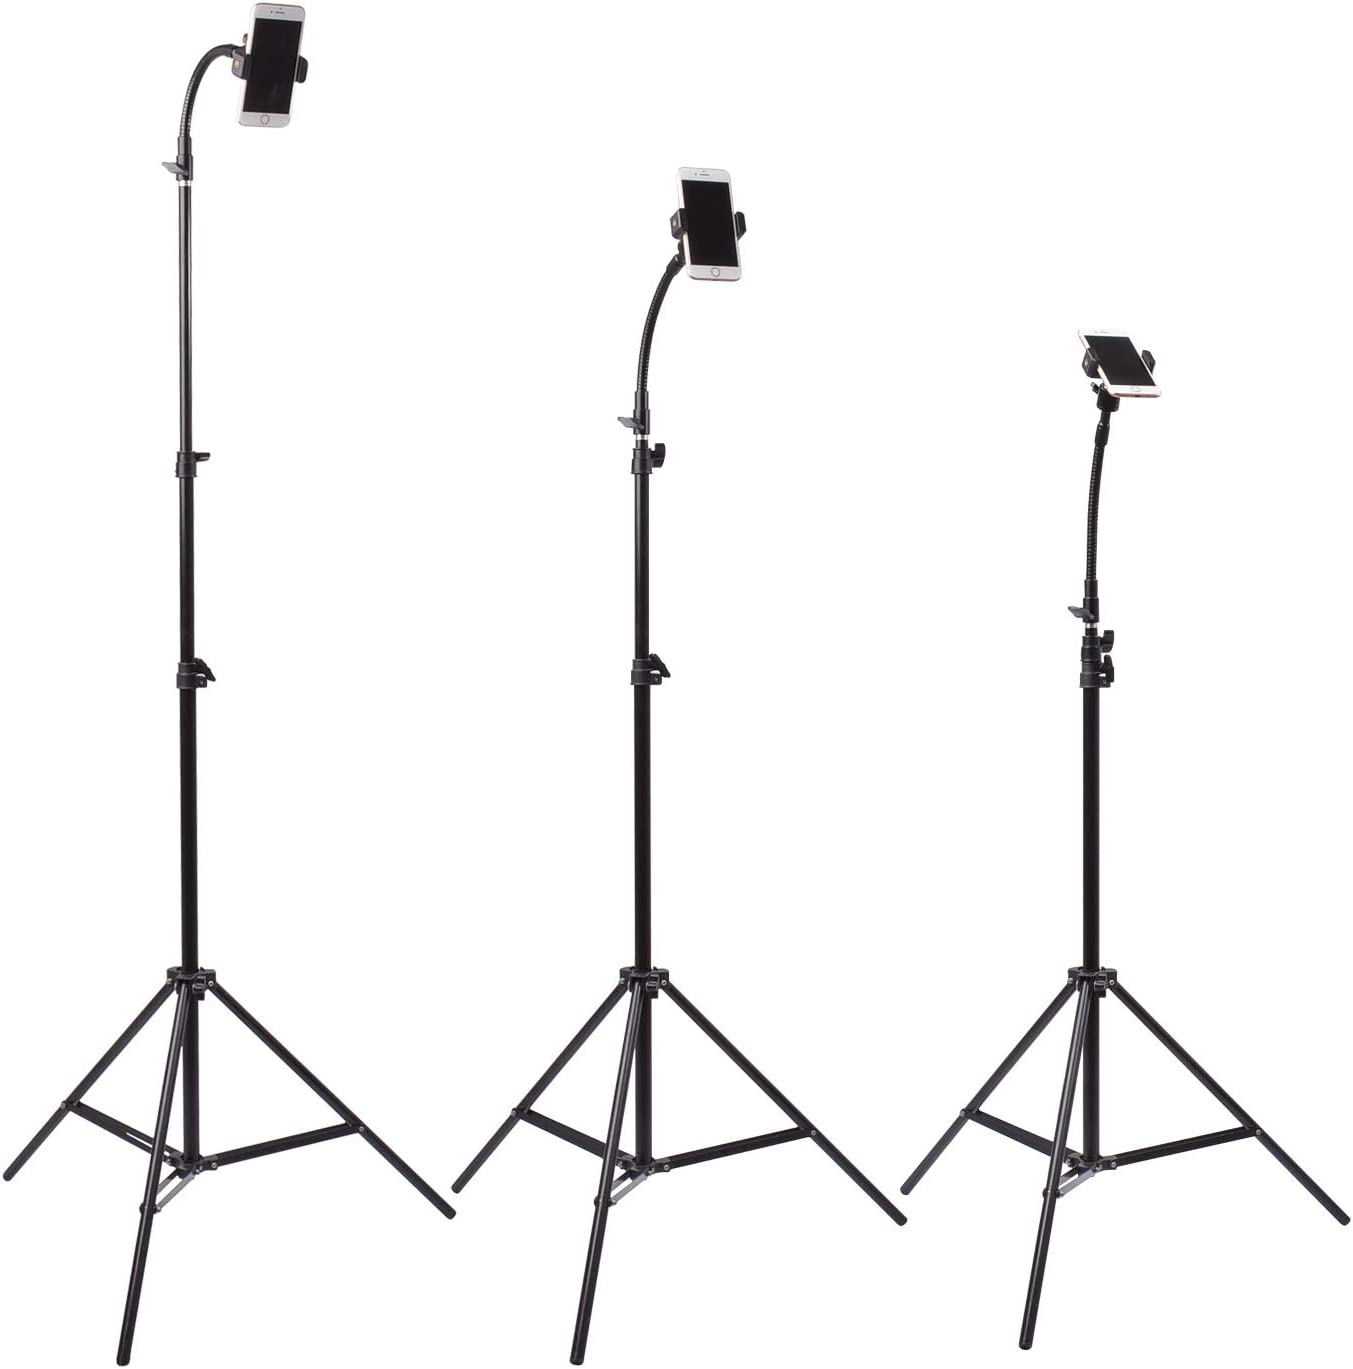 Riqiorod Lichtständer 5 5 Fuß Fotografie Stativ Stativ Kamera